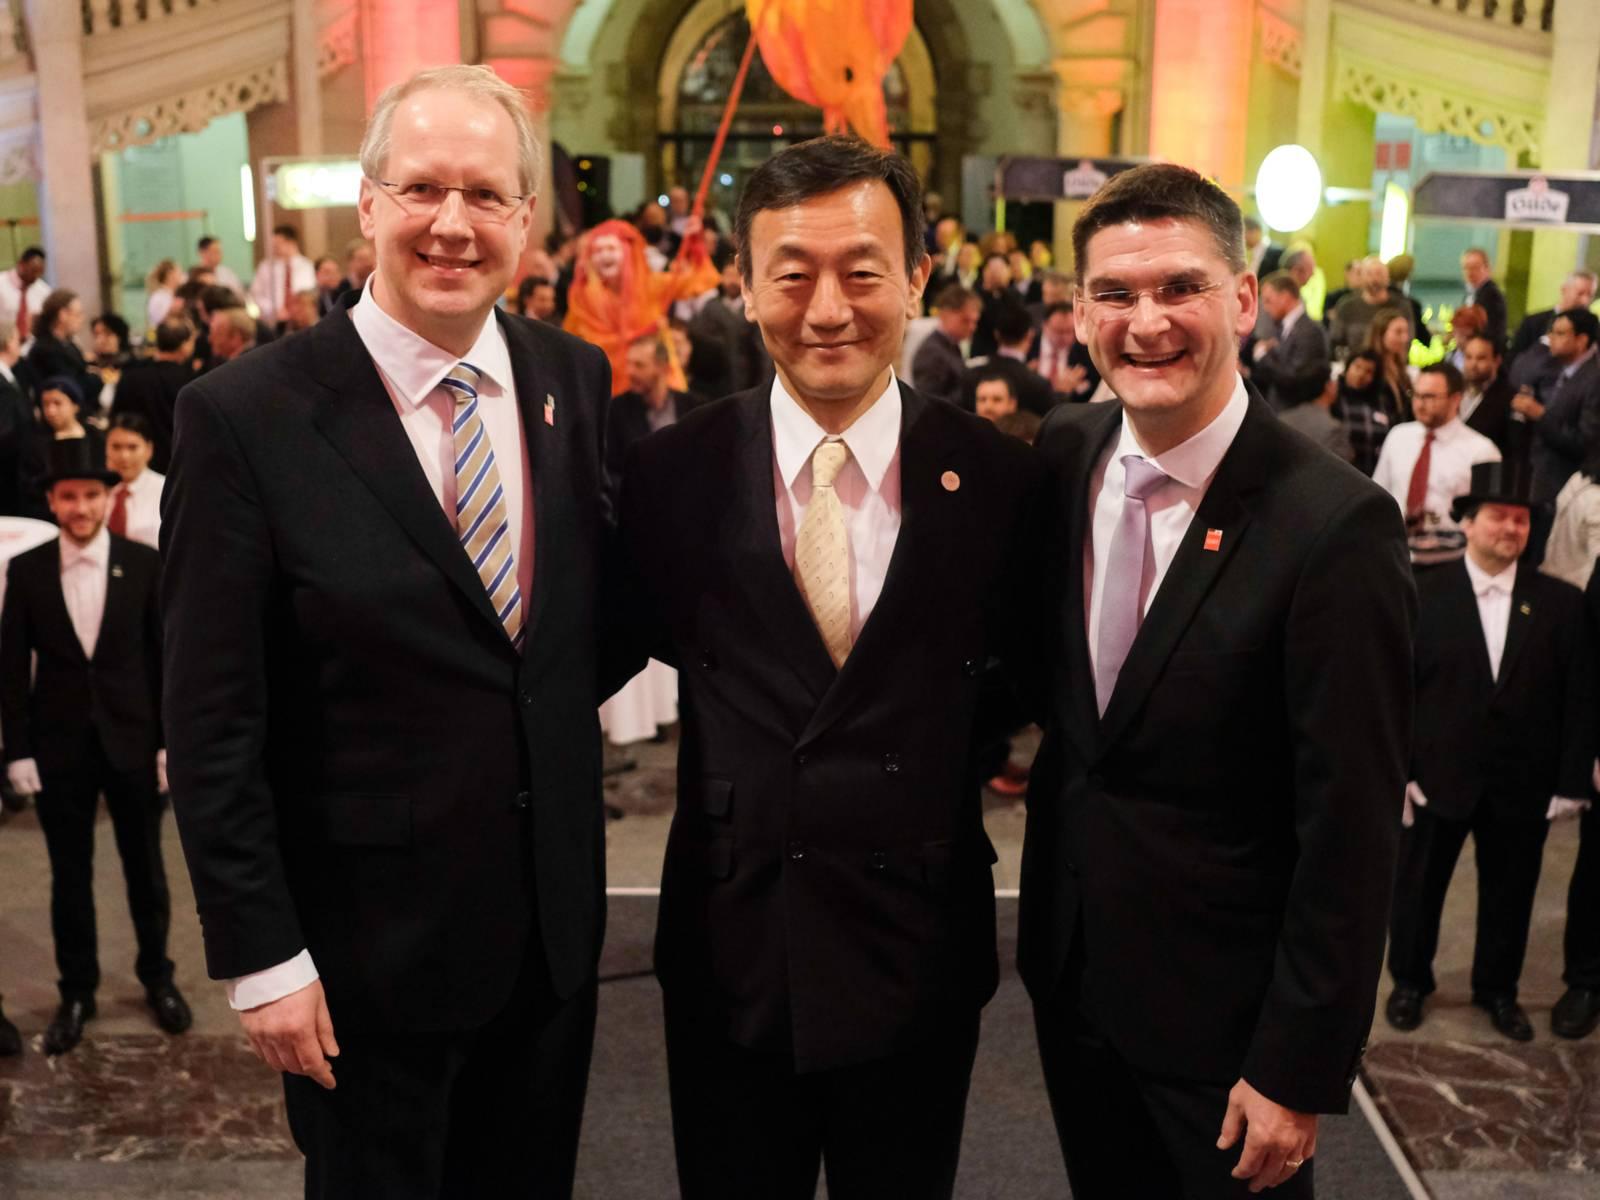 Stefan Schostok, Hitoshi Masuda und Oliver Frese